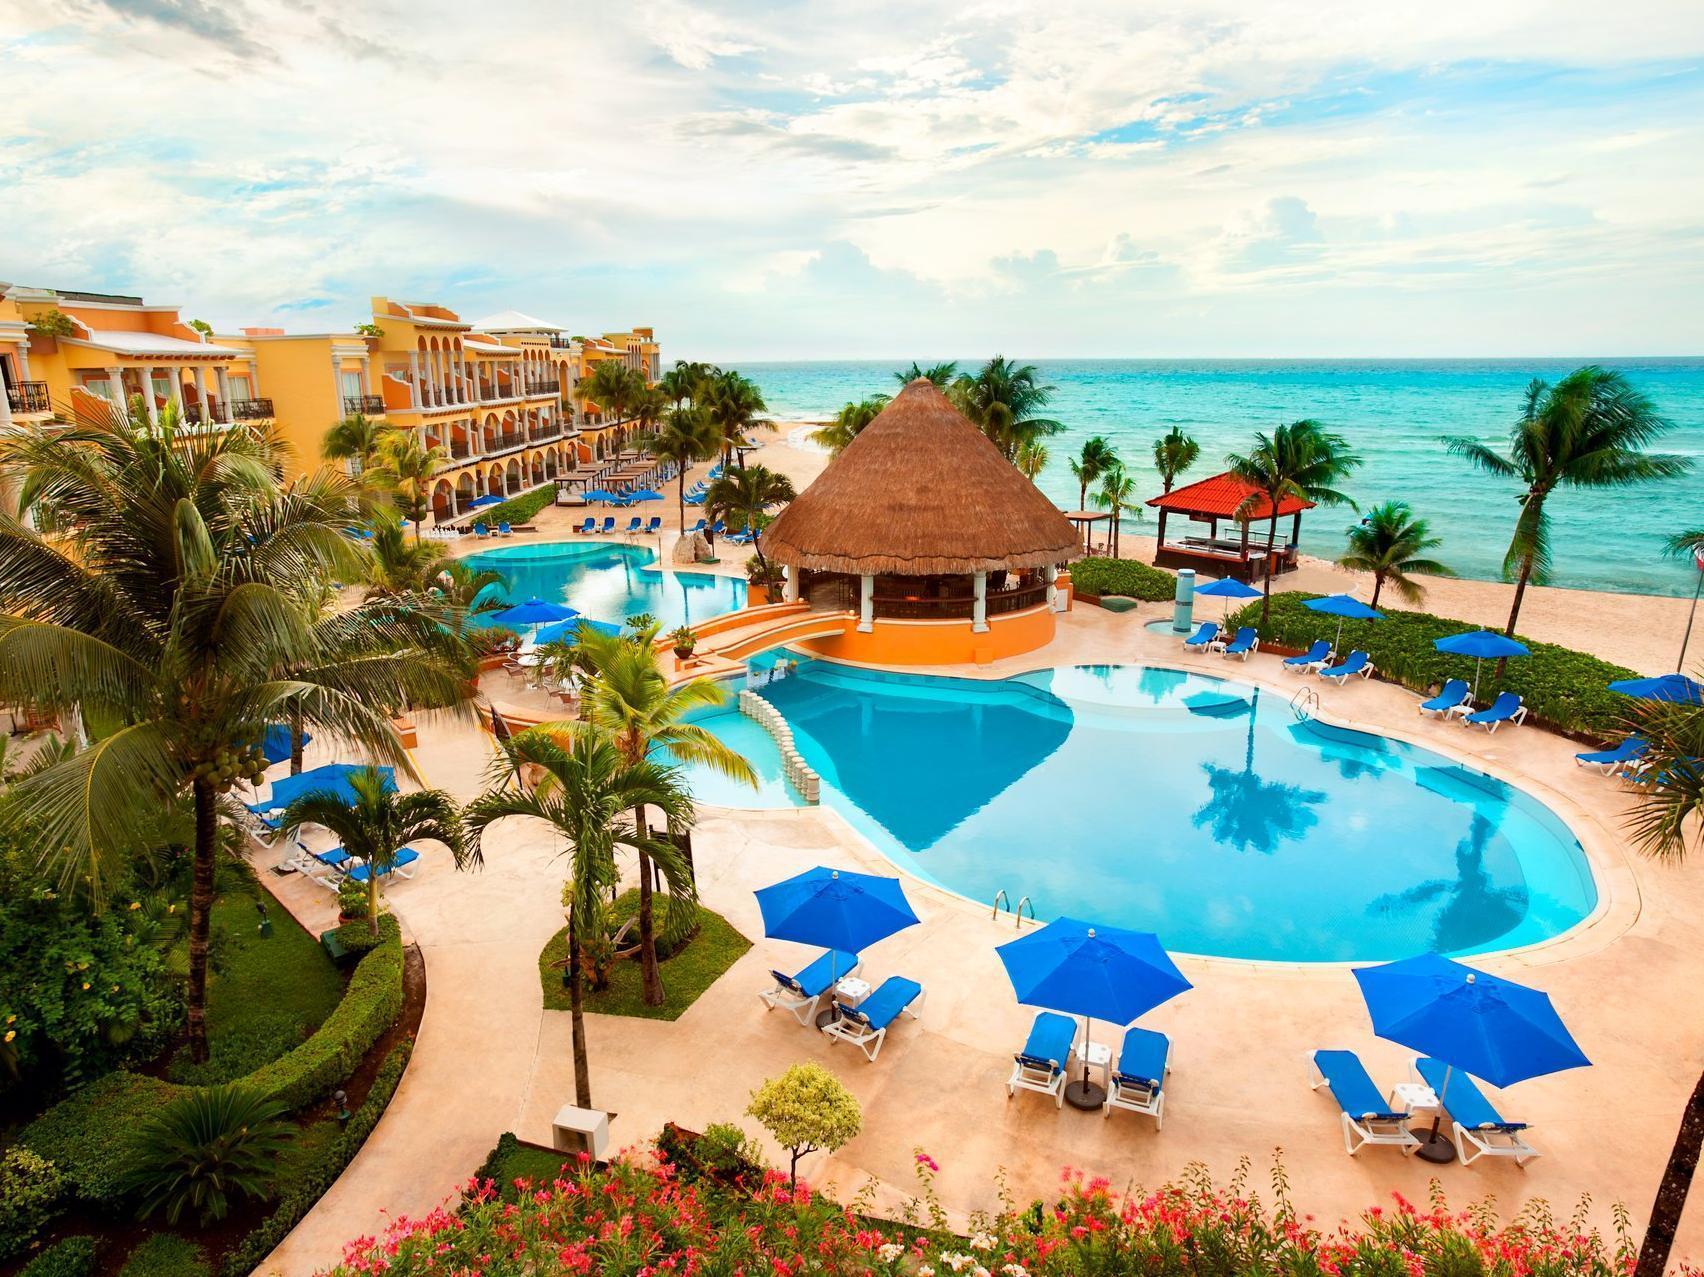 playa del carmen all inclusive family resorts reviews